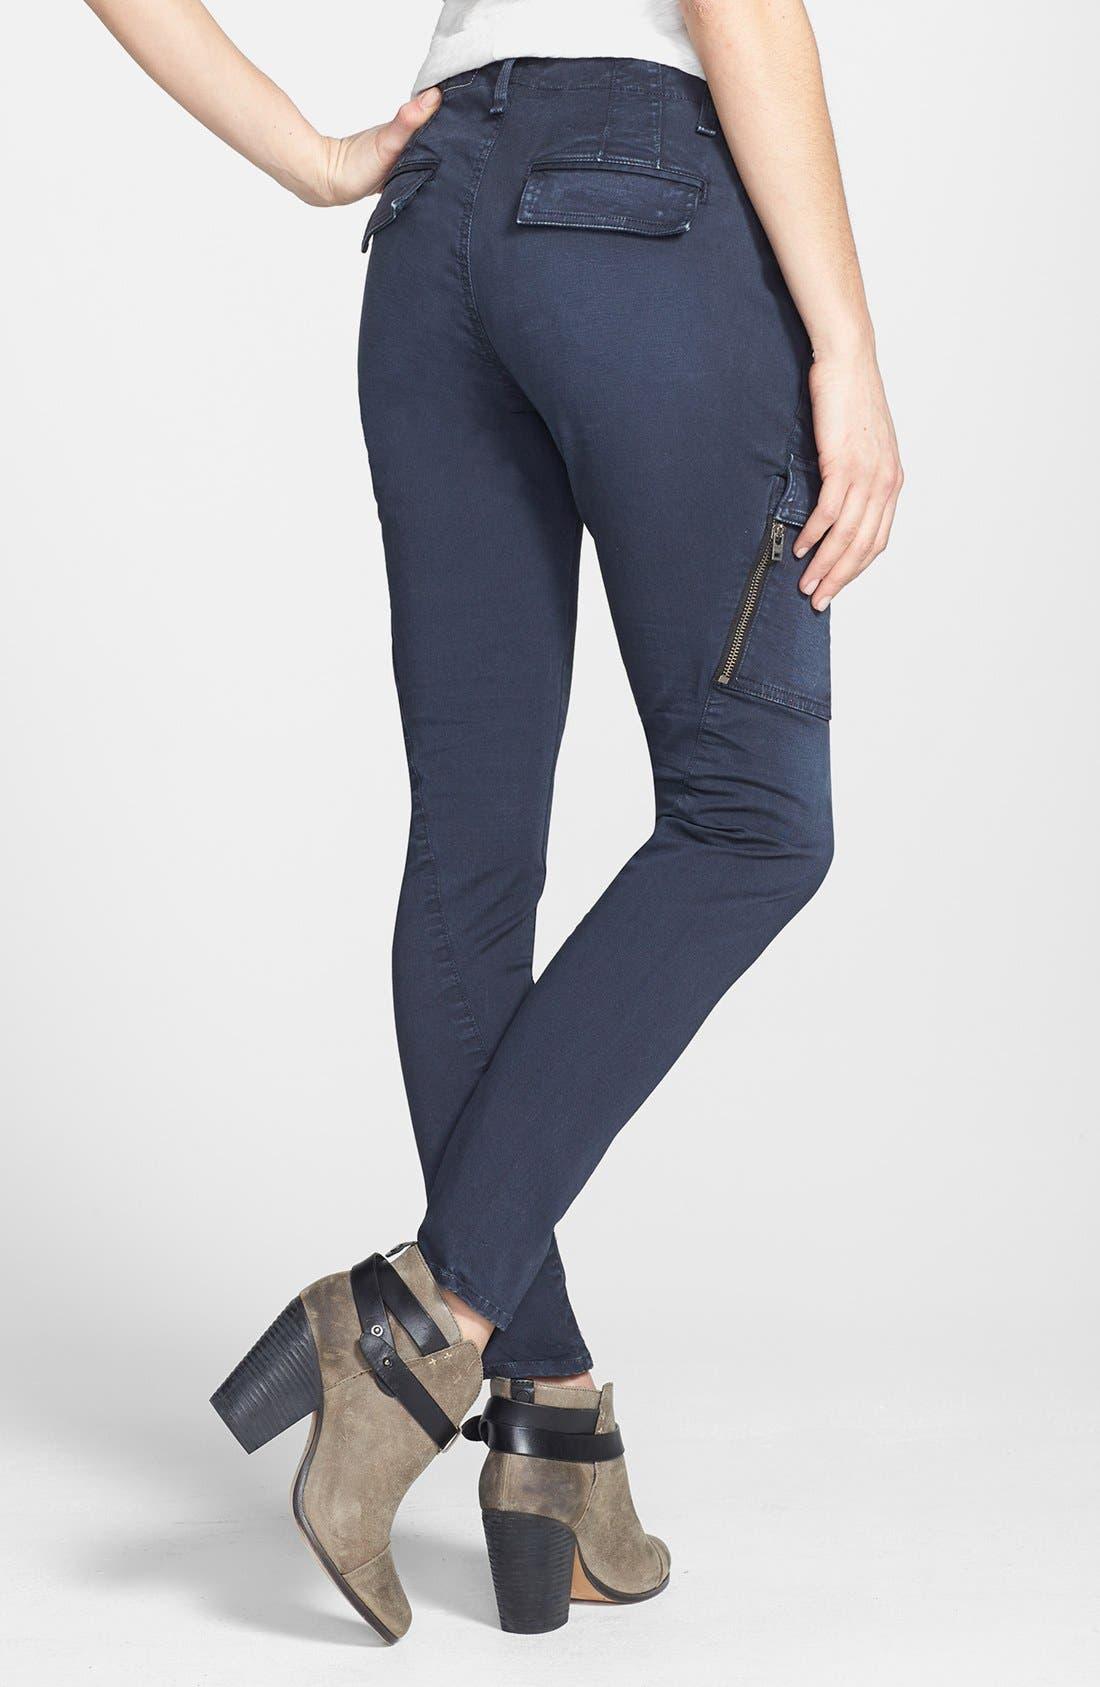 Alternate Image 2  - rag & bone/JEAN 'Bowery' Cargo Skinny Jeans (Distressed Navy)